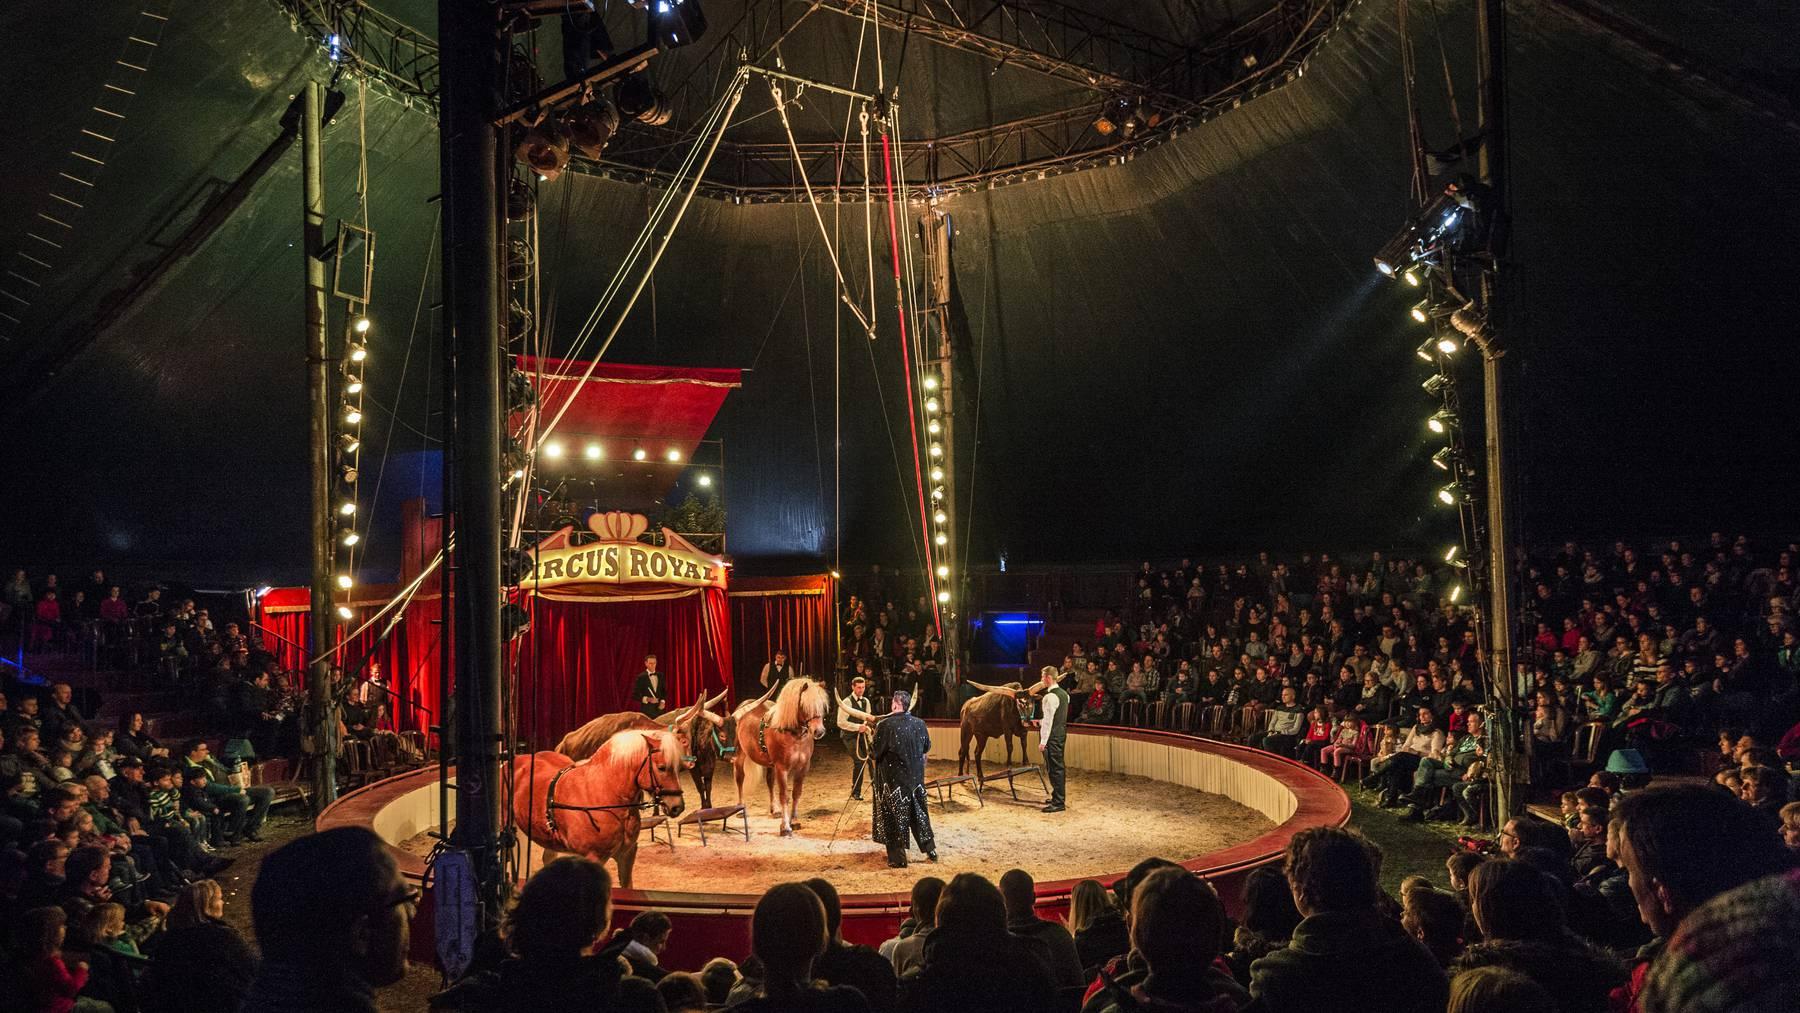 Circus Royal